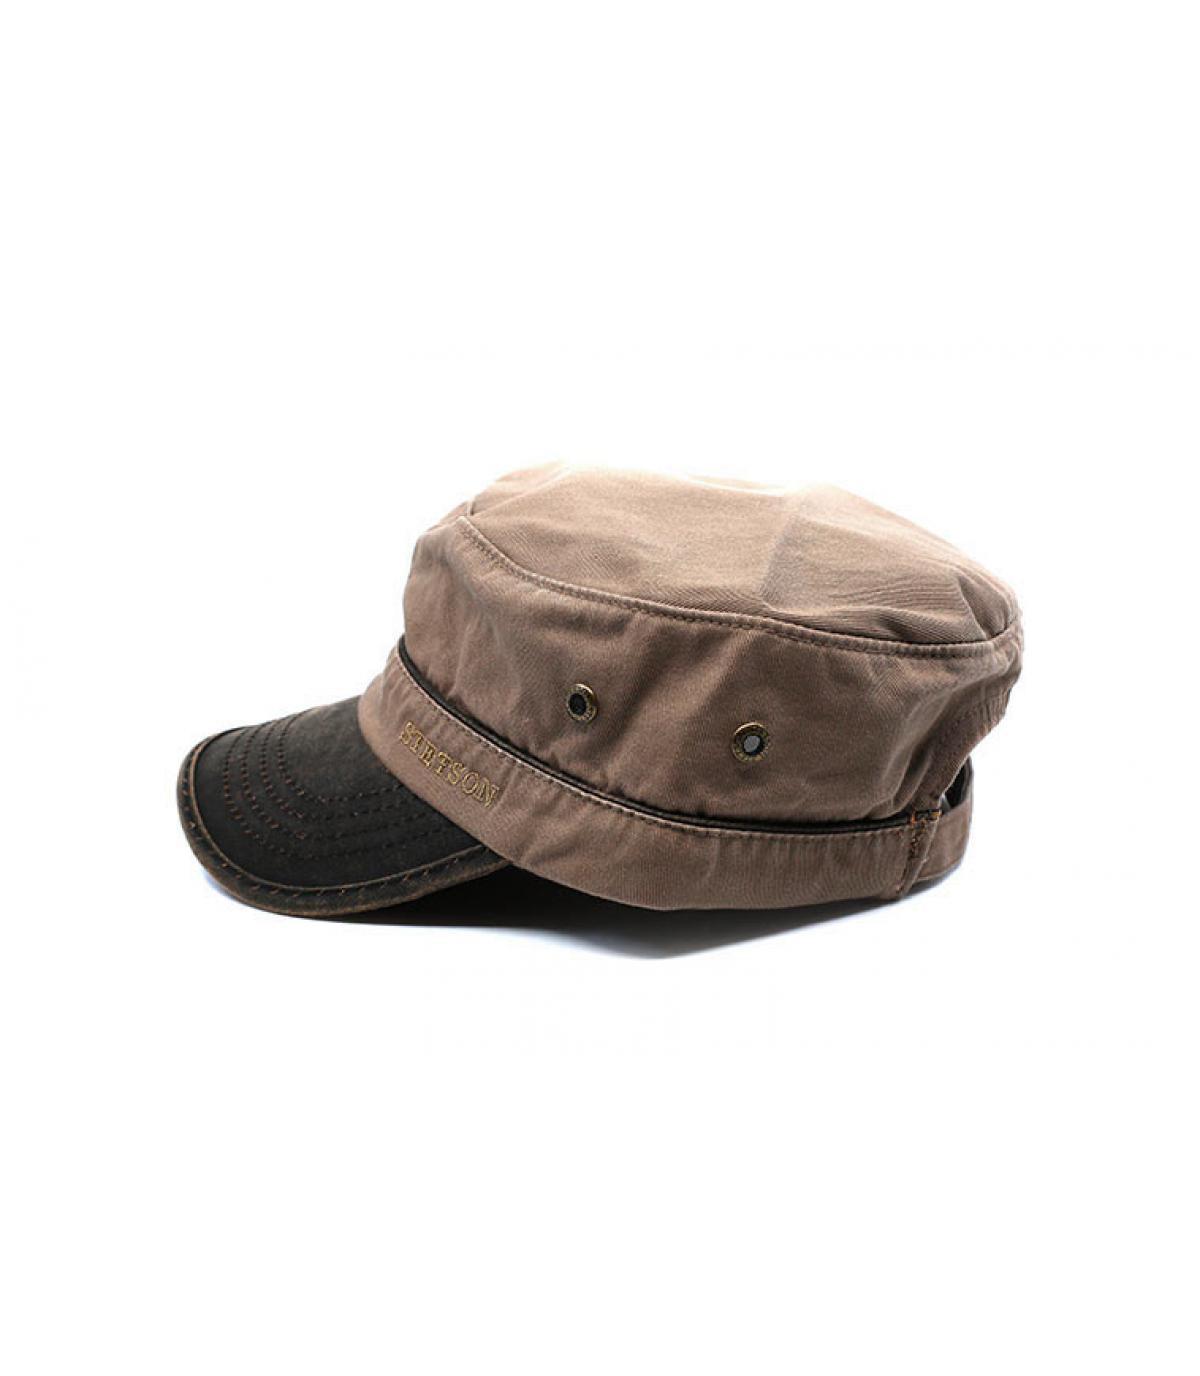 Detalles Army Cap Cotton brown imagen 4